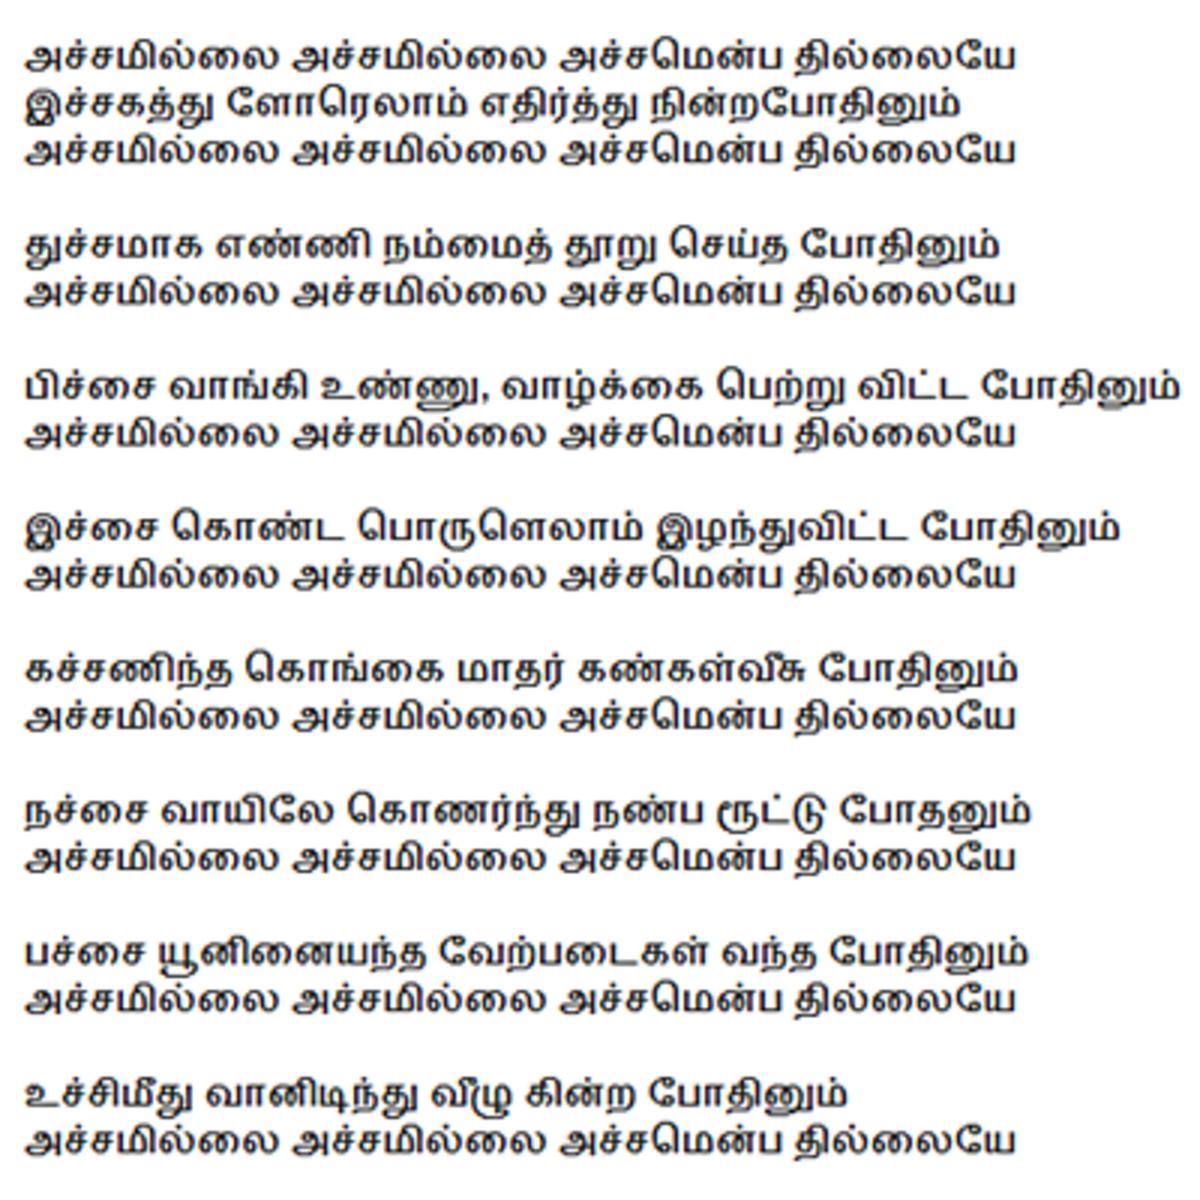 Subramaniya Bharathi - Great Poet of Tamil Nadu  | HubPages